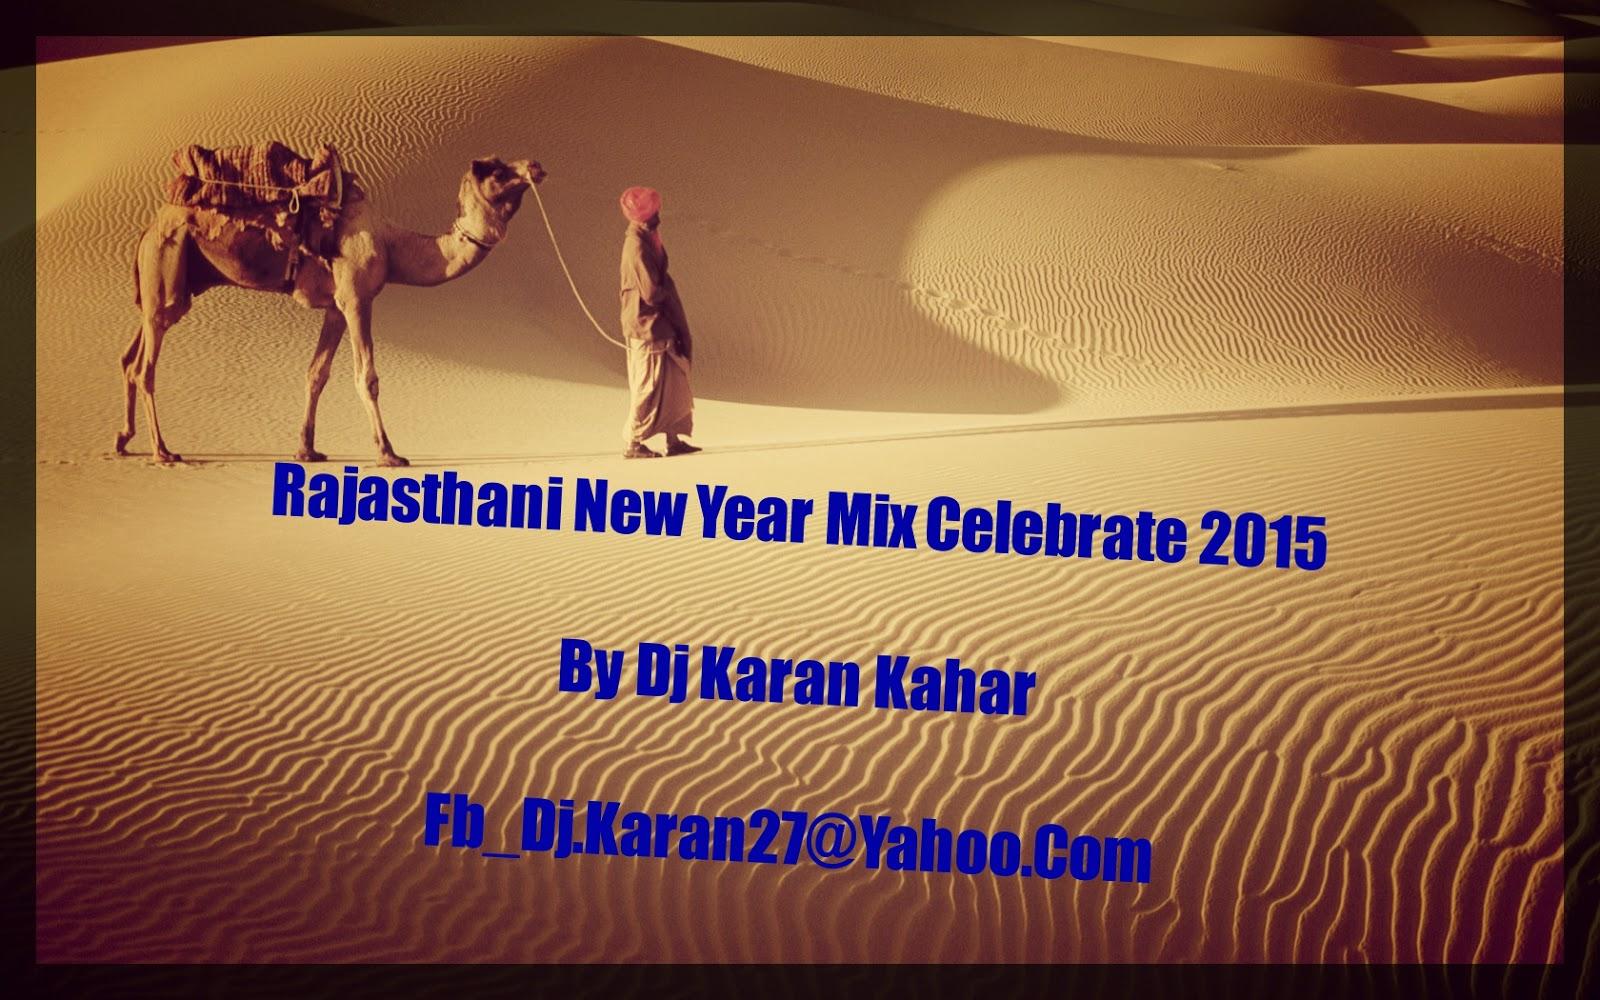 Rajasthani New Year Mix Celebrate 2015 By Dj Karan Kahar